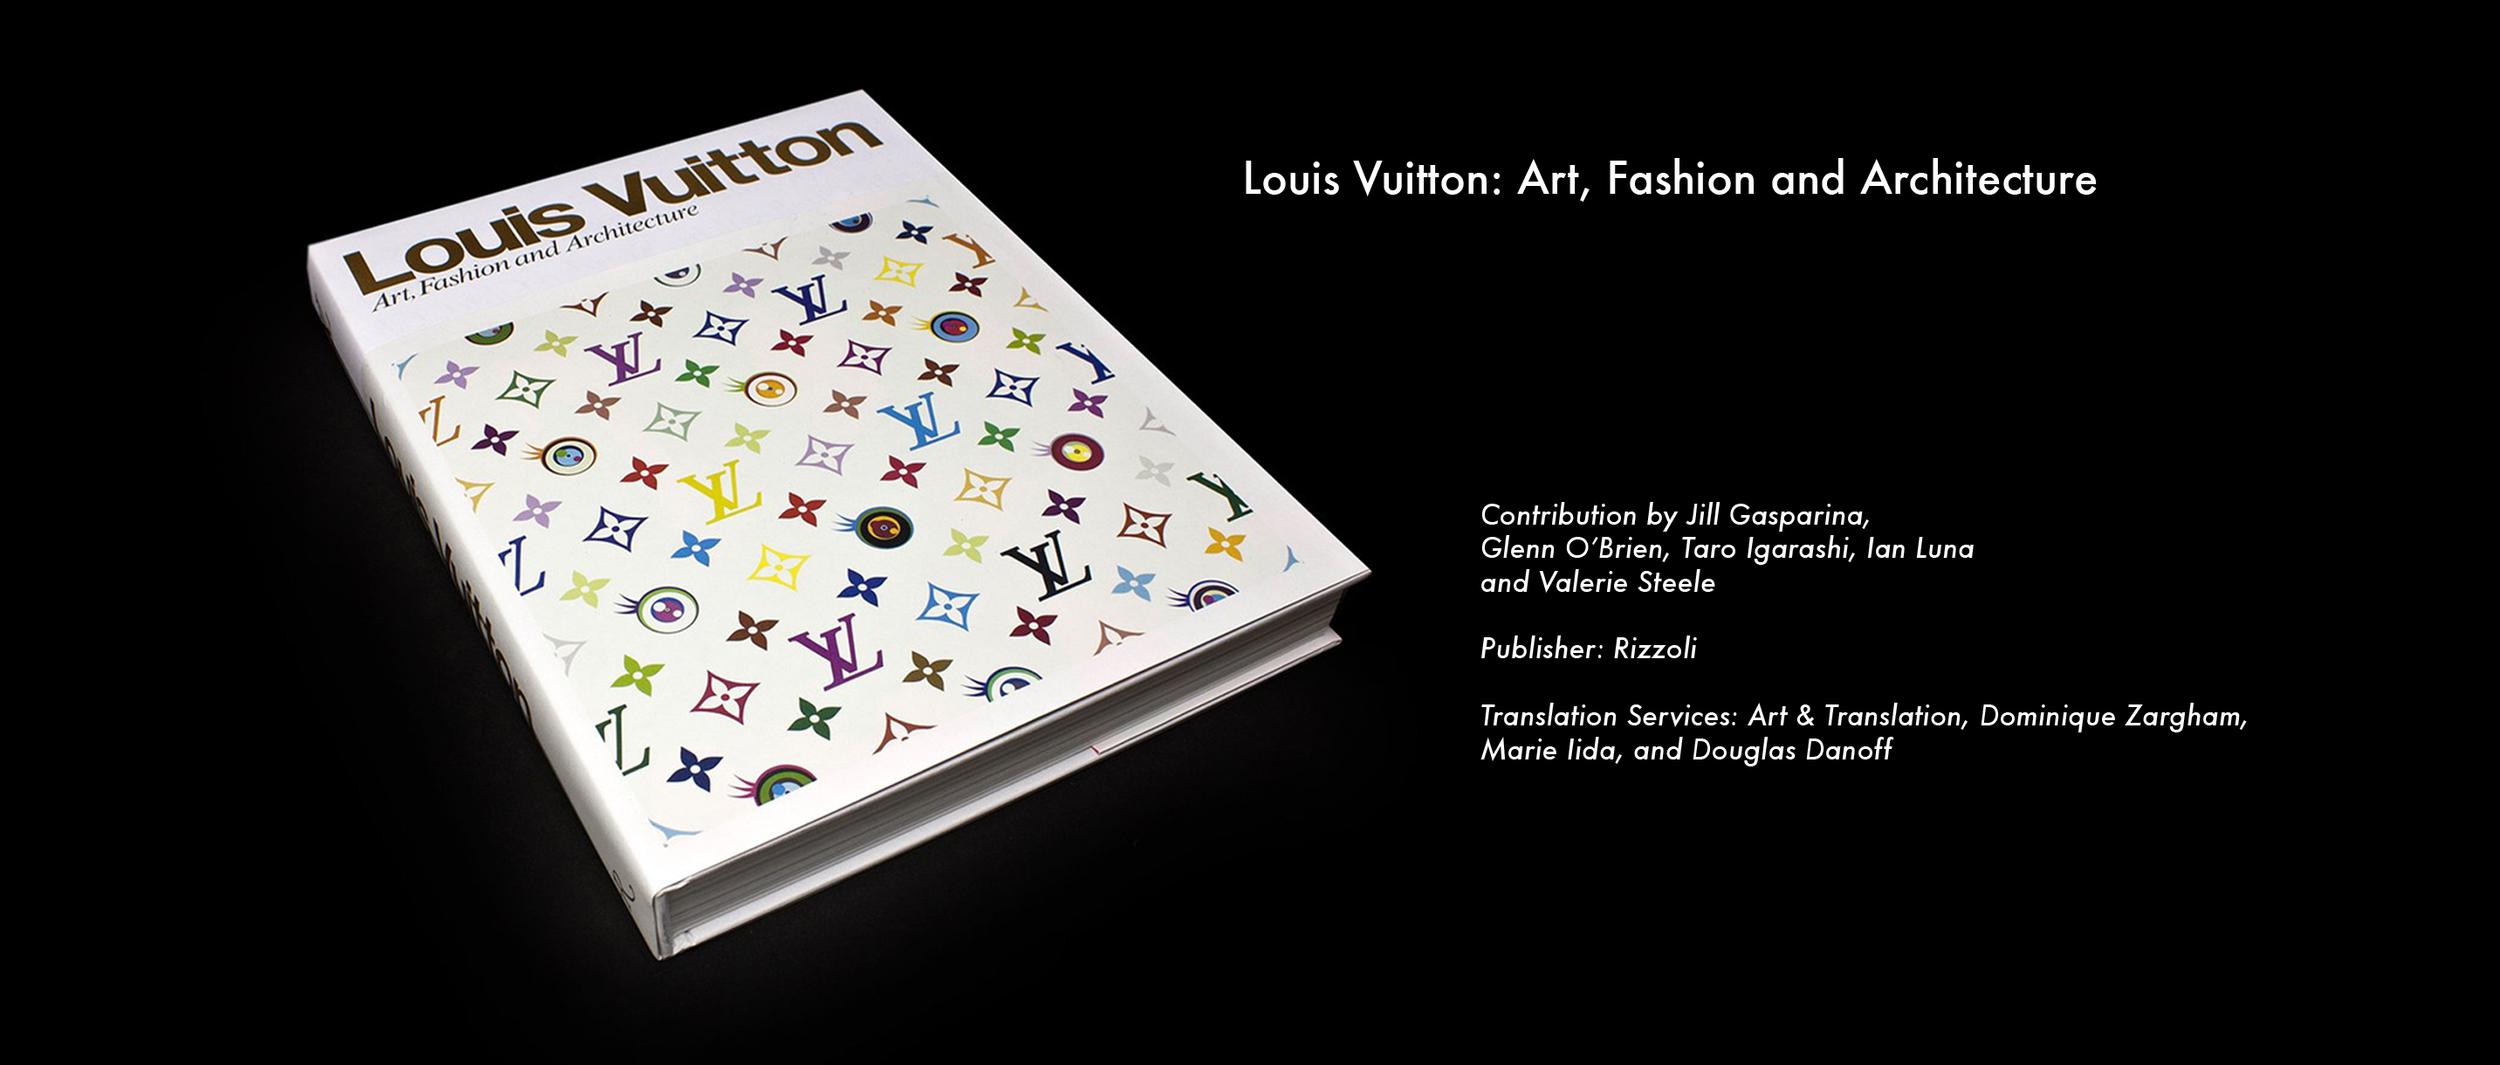 LouisVouittonArtBook.png